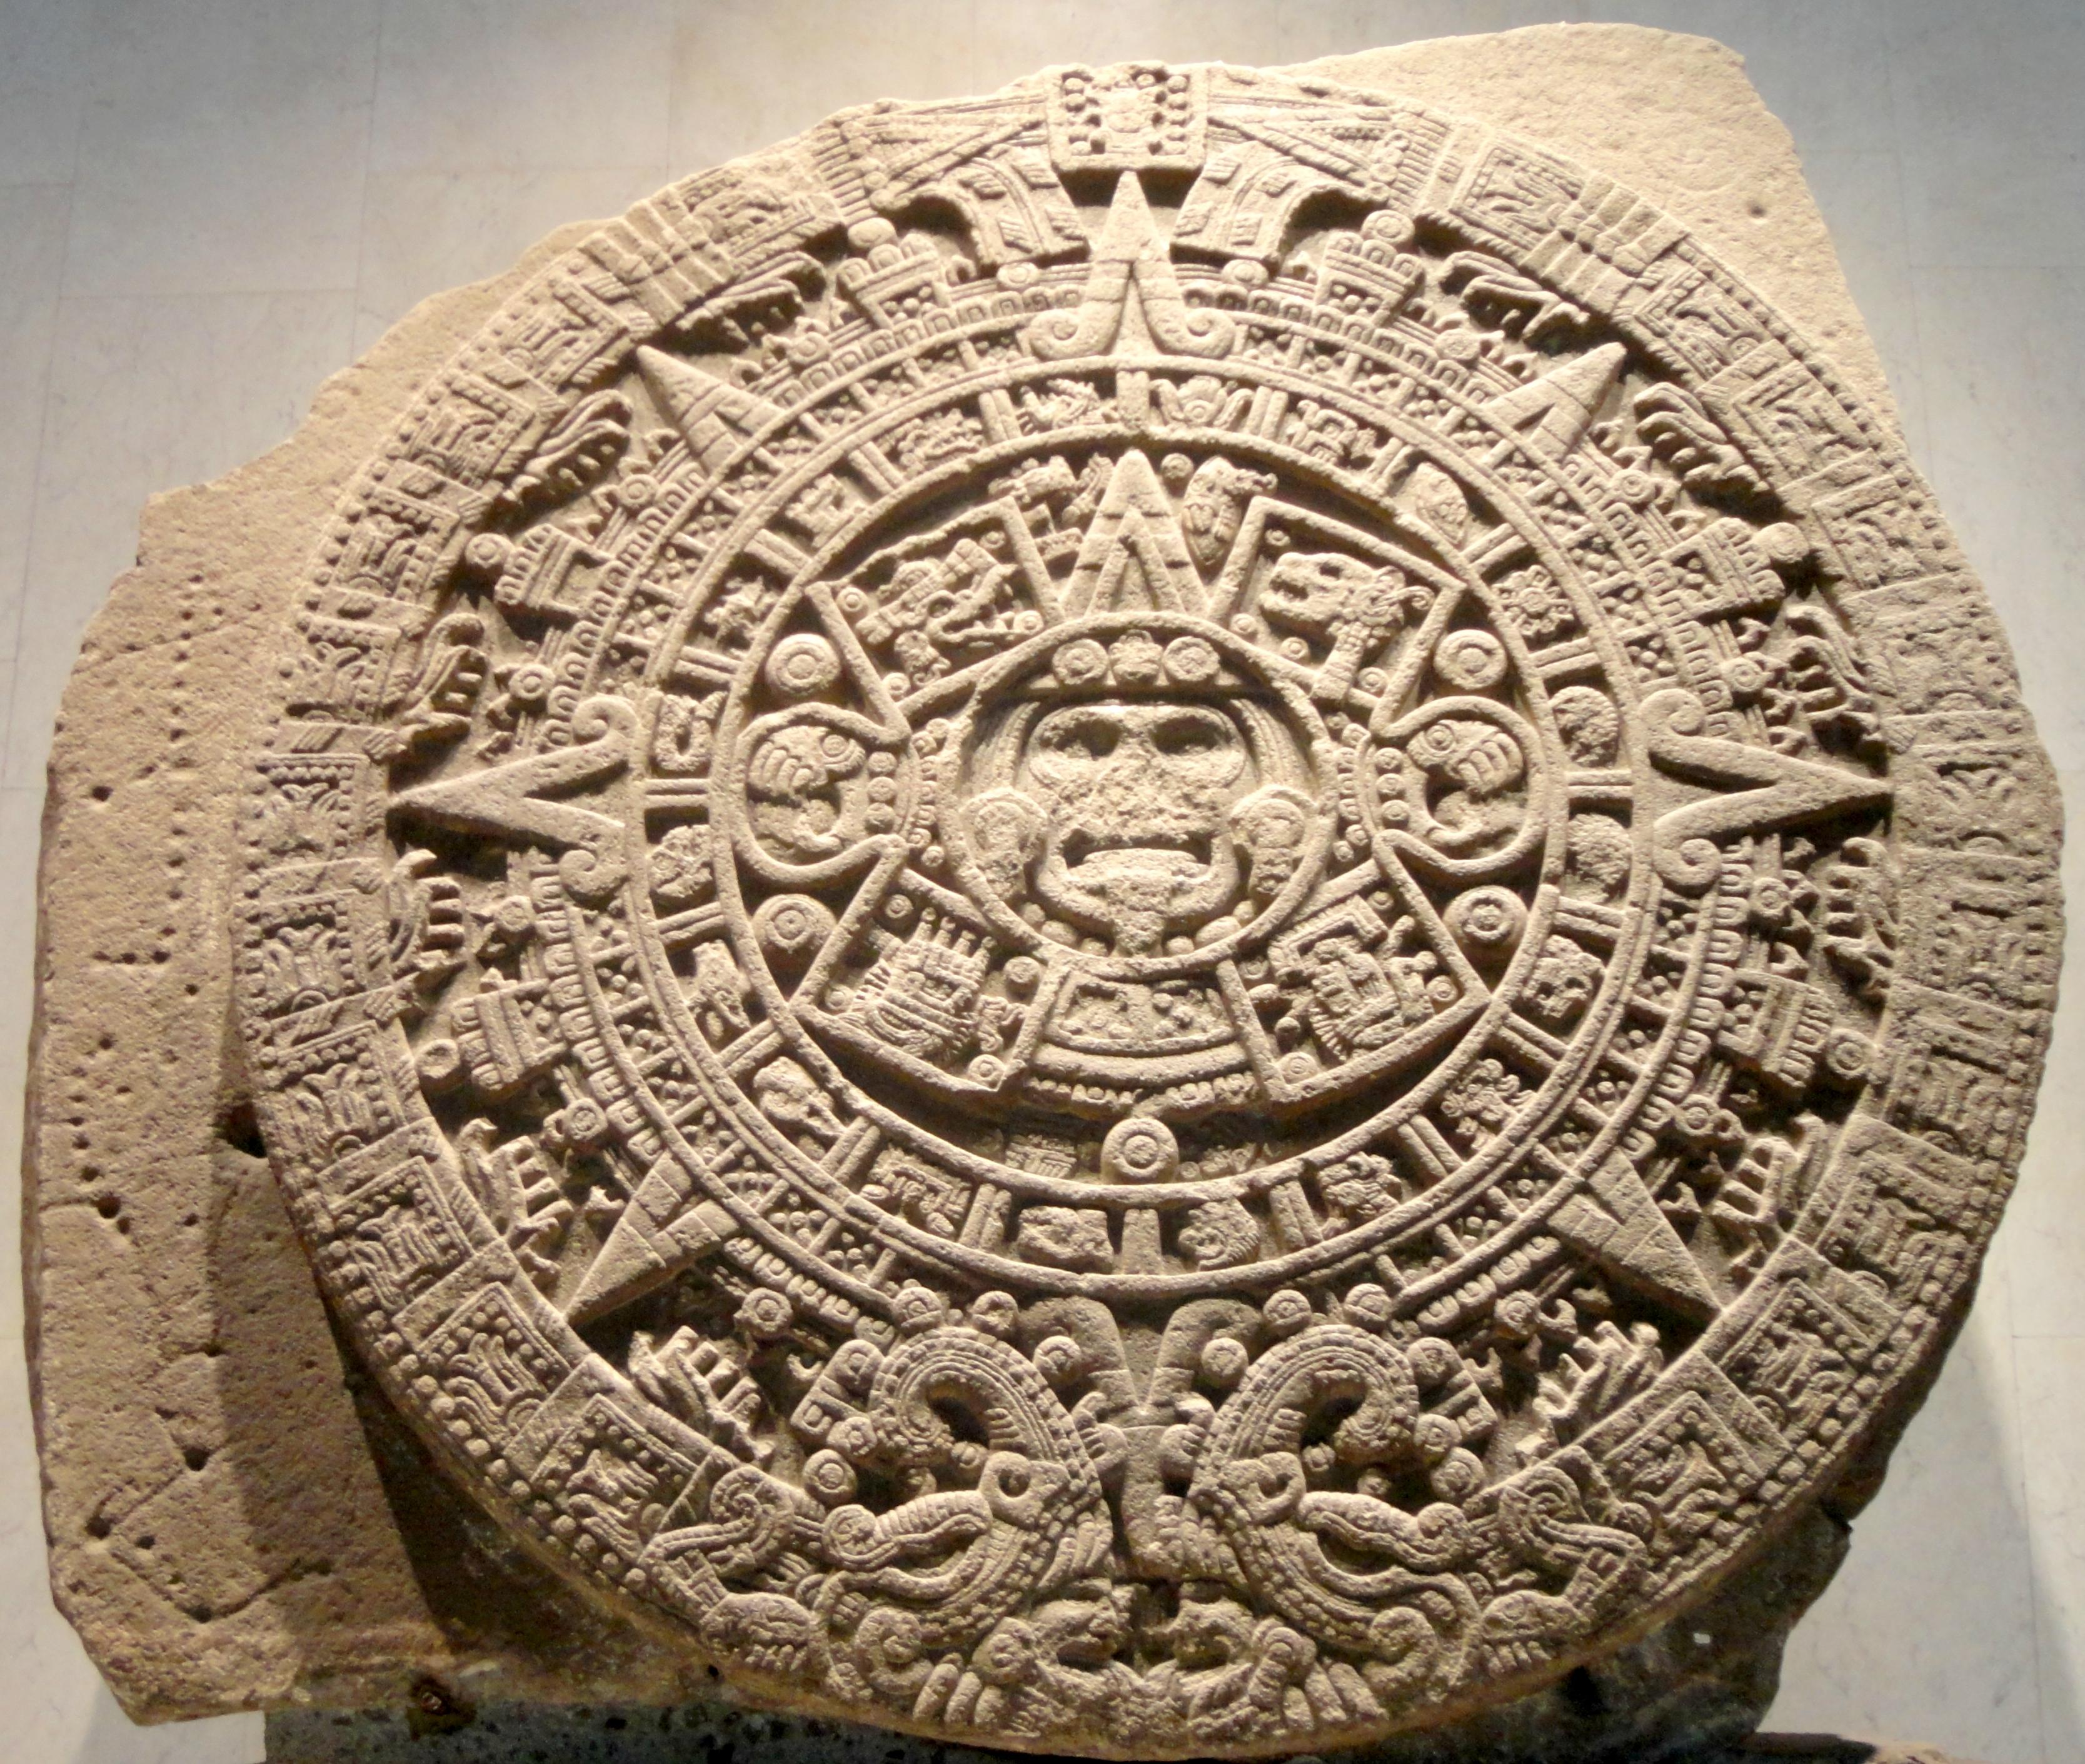 Aztec Sun Stone - Wikipedia inside Aztec Calendar Printable Template